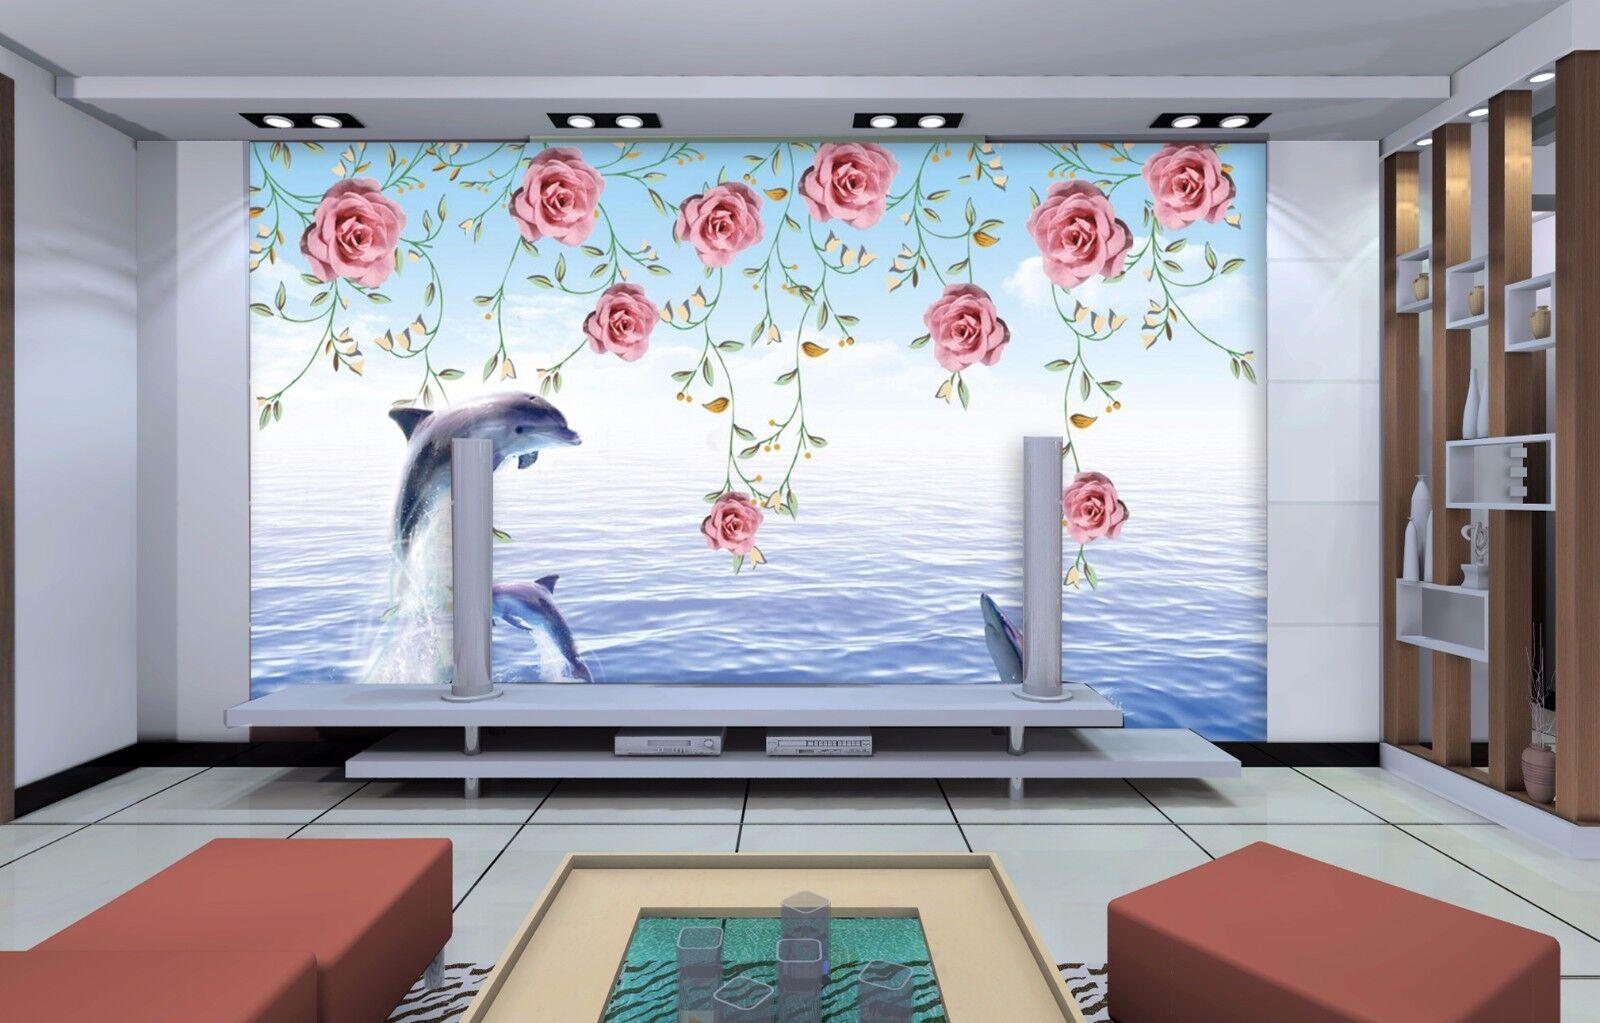 3D Jumping Flower Dolphin  Wall paper Decal Dercor Home Kids Nursery Mural  Home